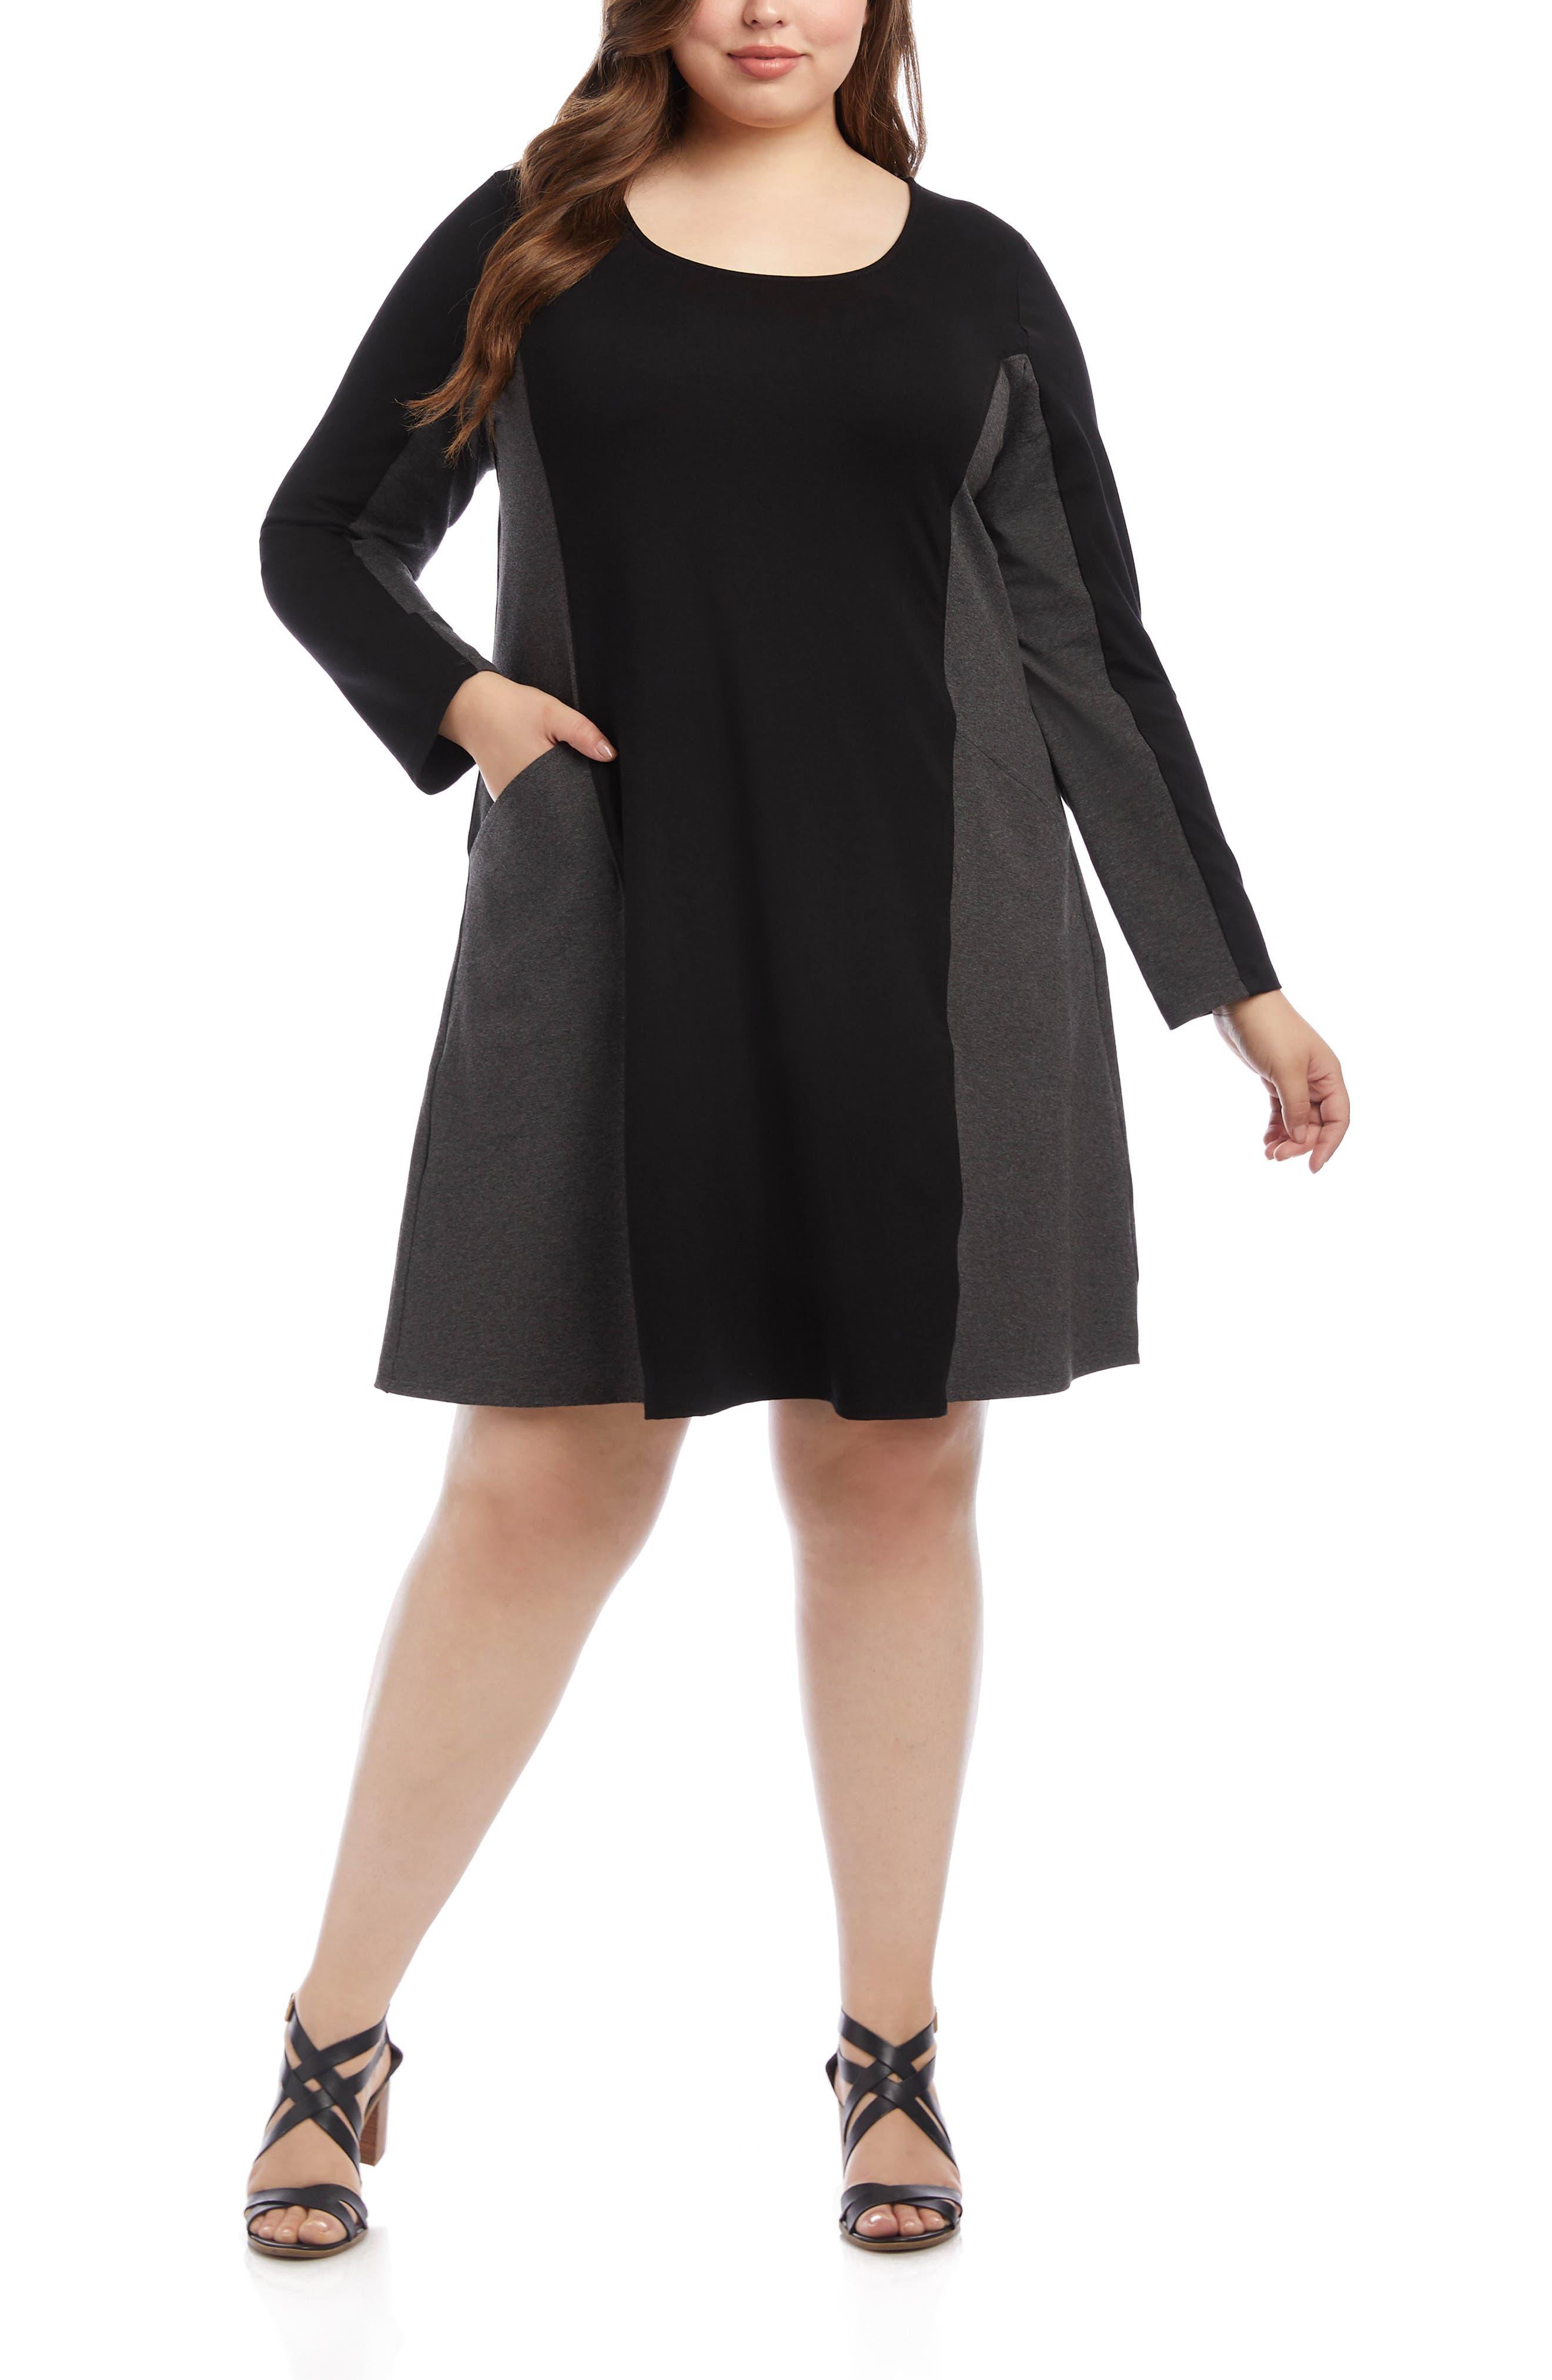 60s 70s Plus Size Dresses, Clothing, Costumes Plus Size Womens Karen Kane Colorblock Pocket Long Sleeve Dress $89.60 AT vintagedancer.com